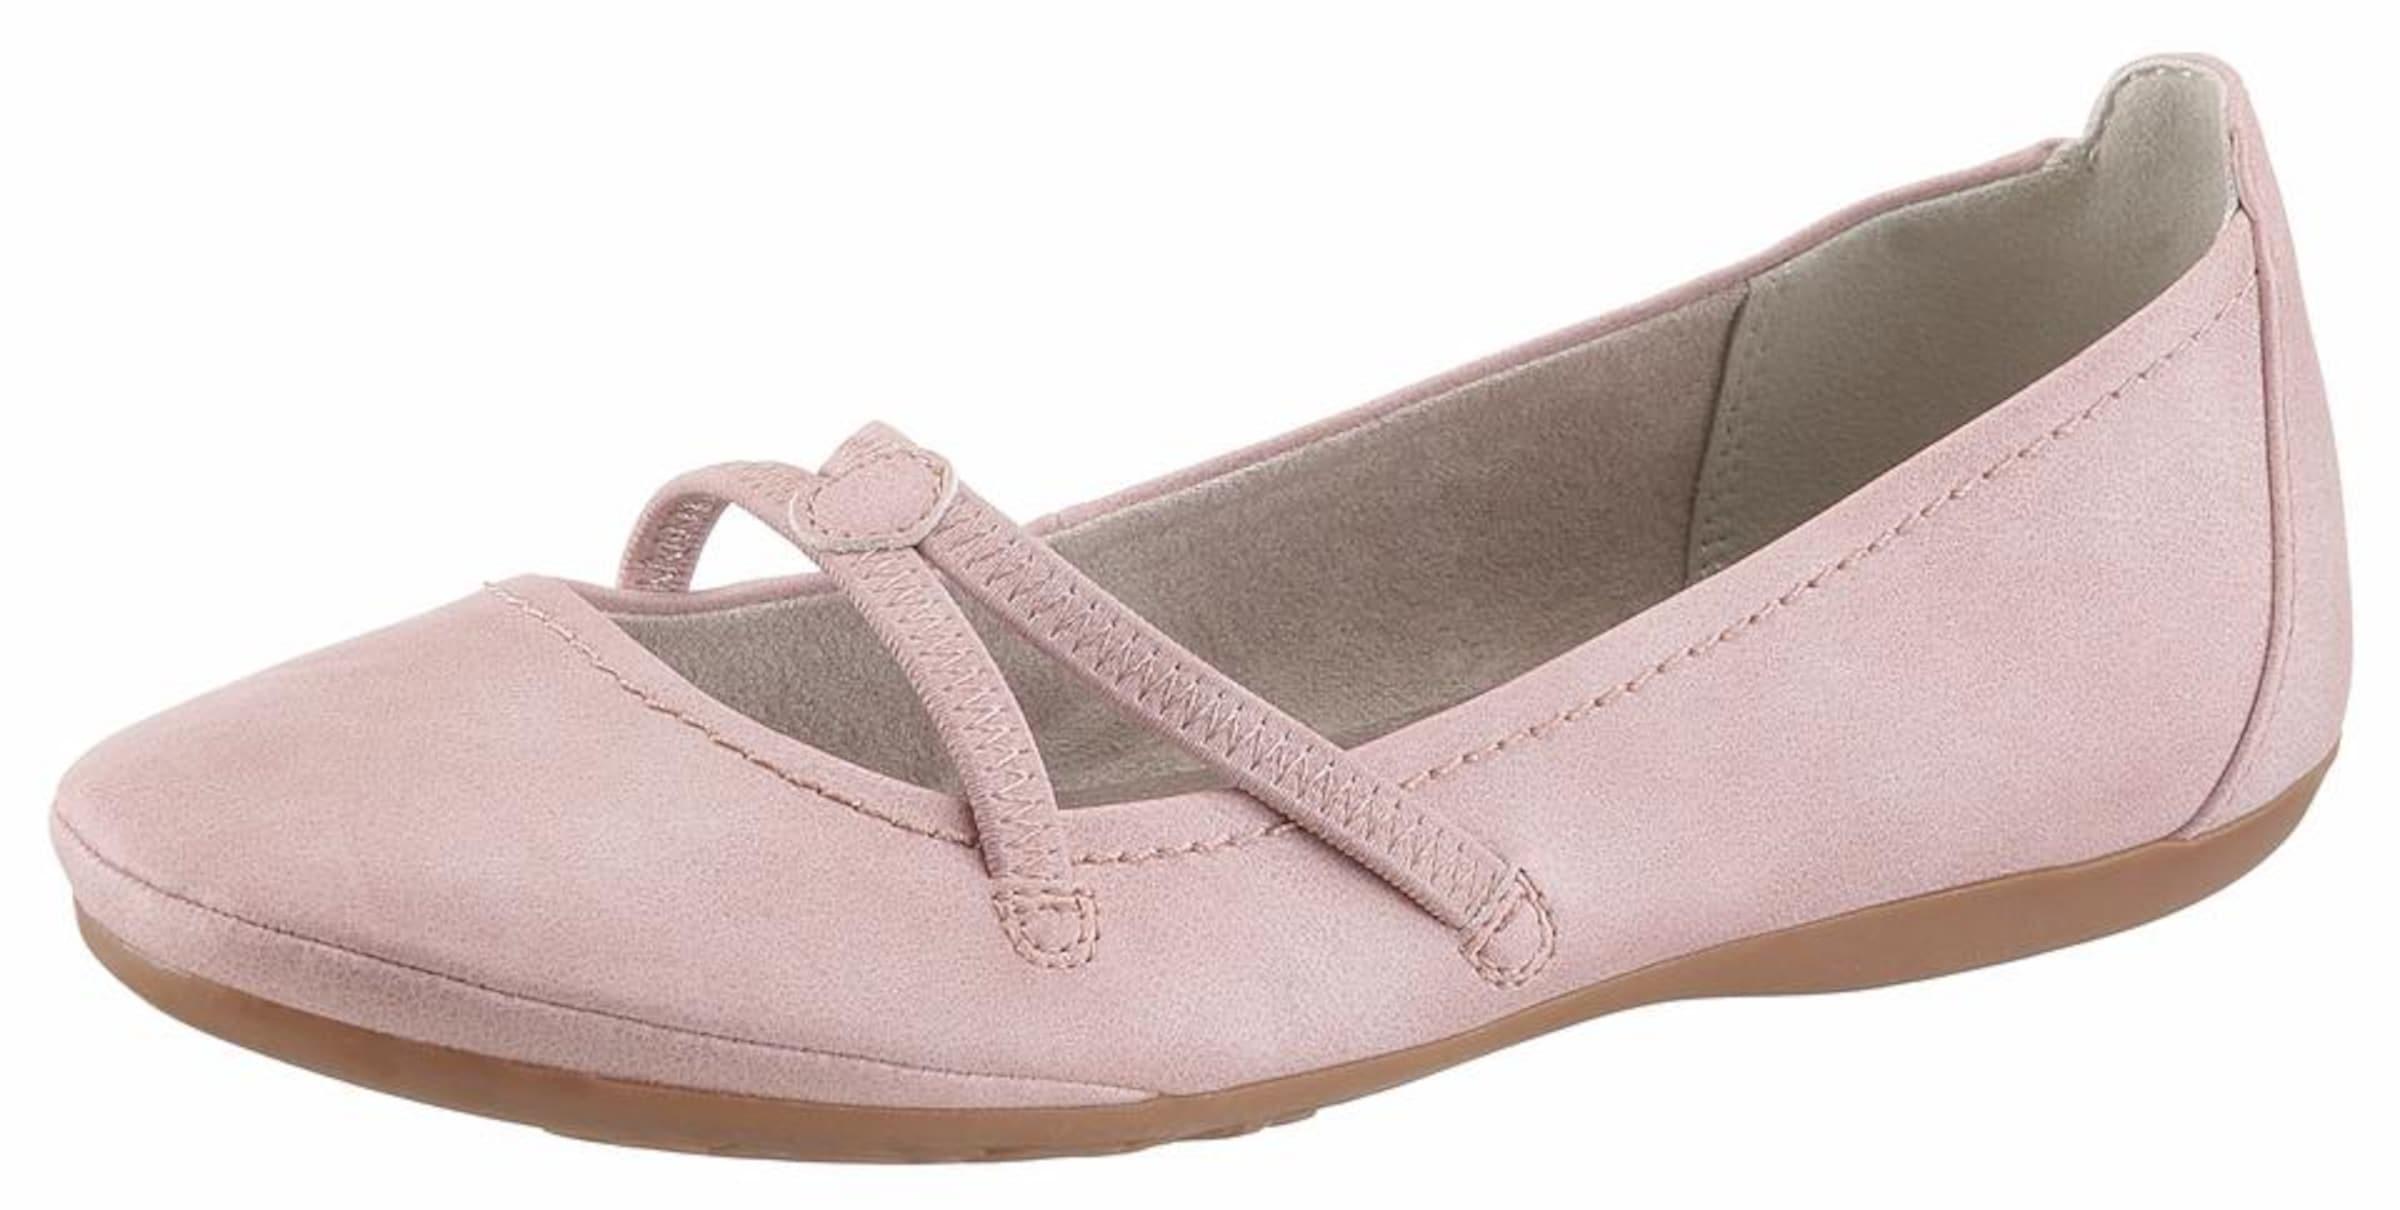 Haltbare Mode billige Schuhe TAMARIS | Riemchenballerina Schuhe Gut getragene Schuhe